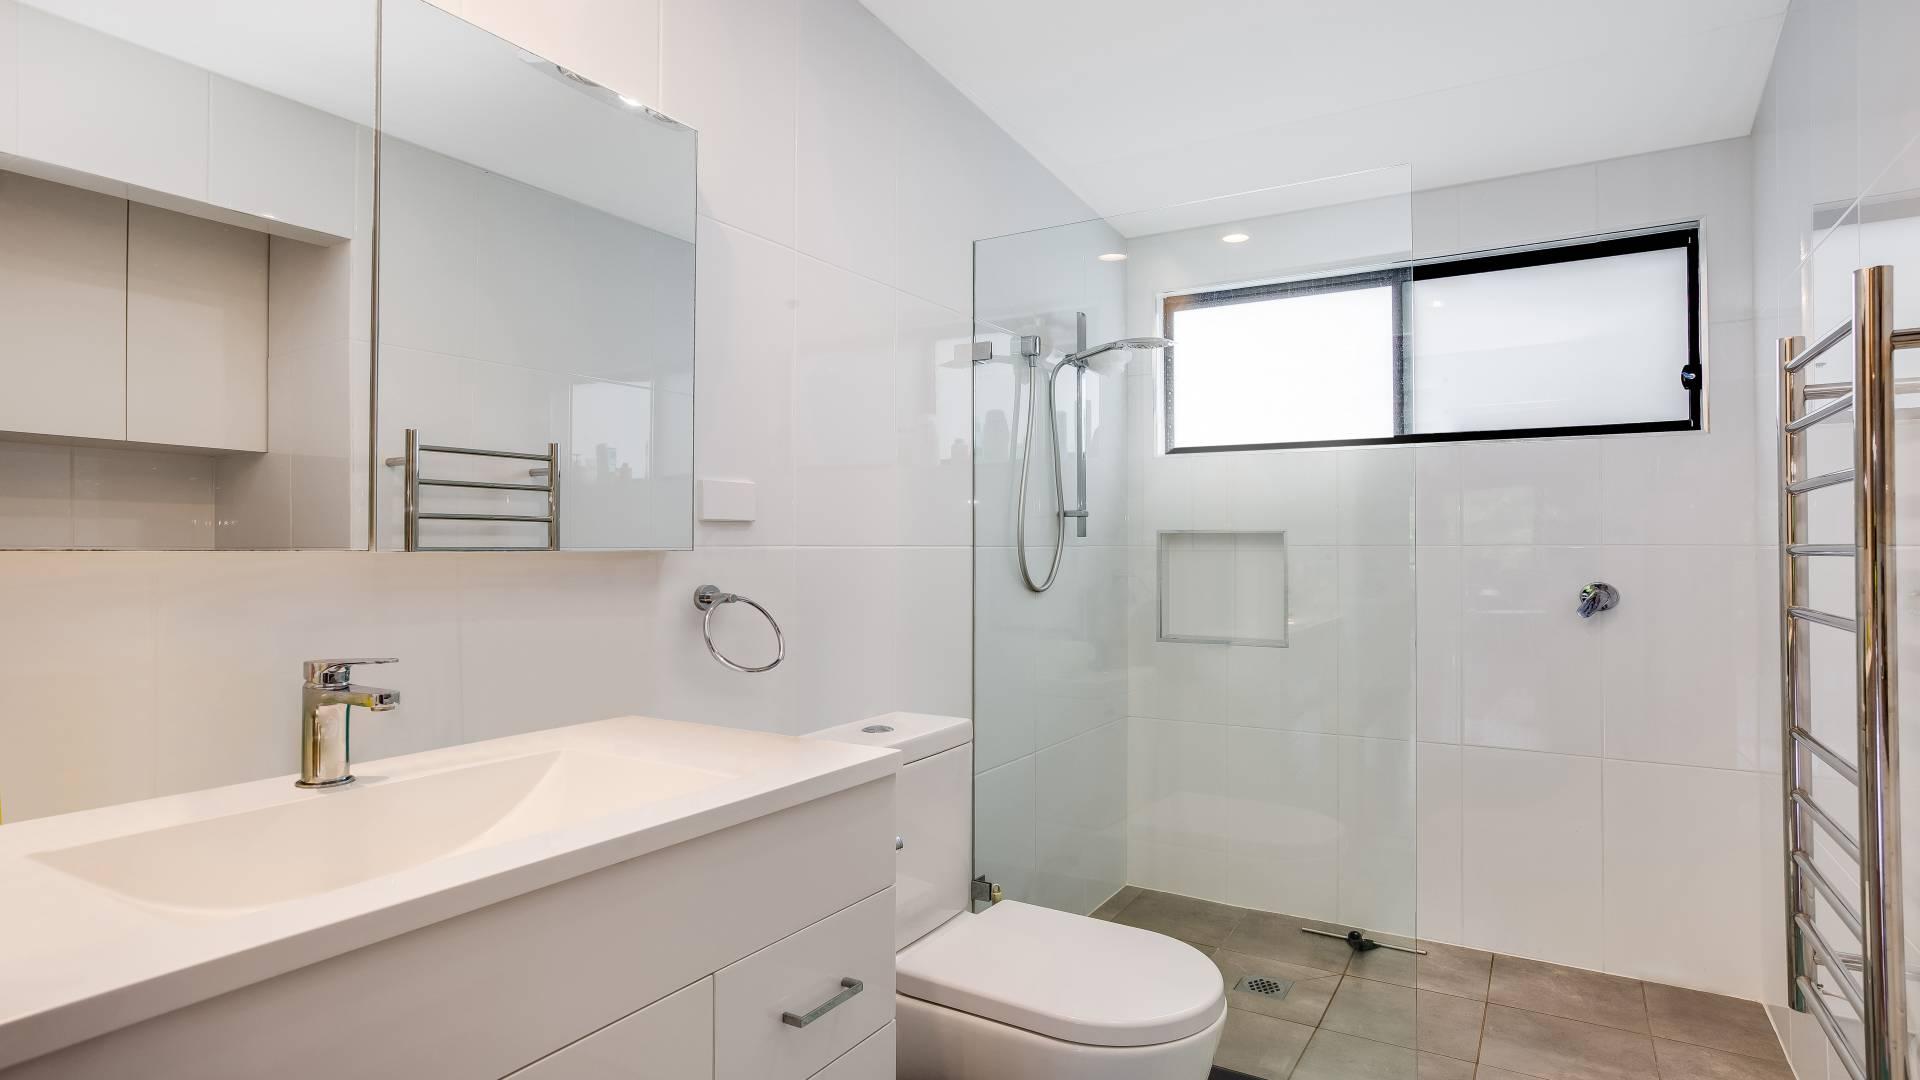 architecturally designed granny flat bath ipswich